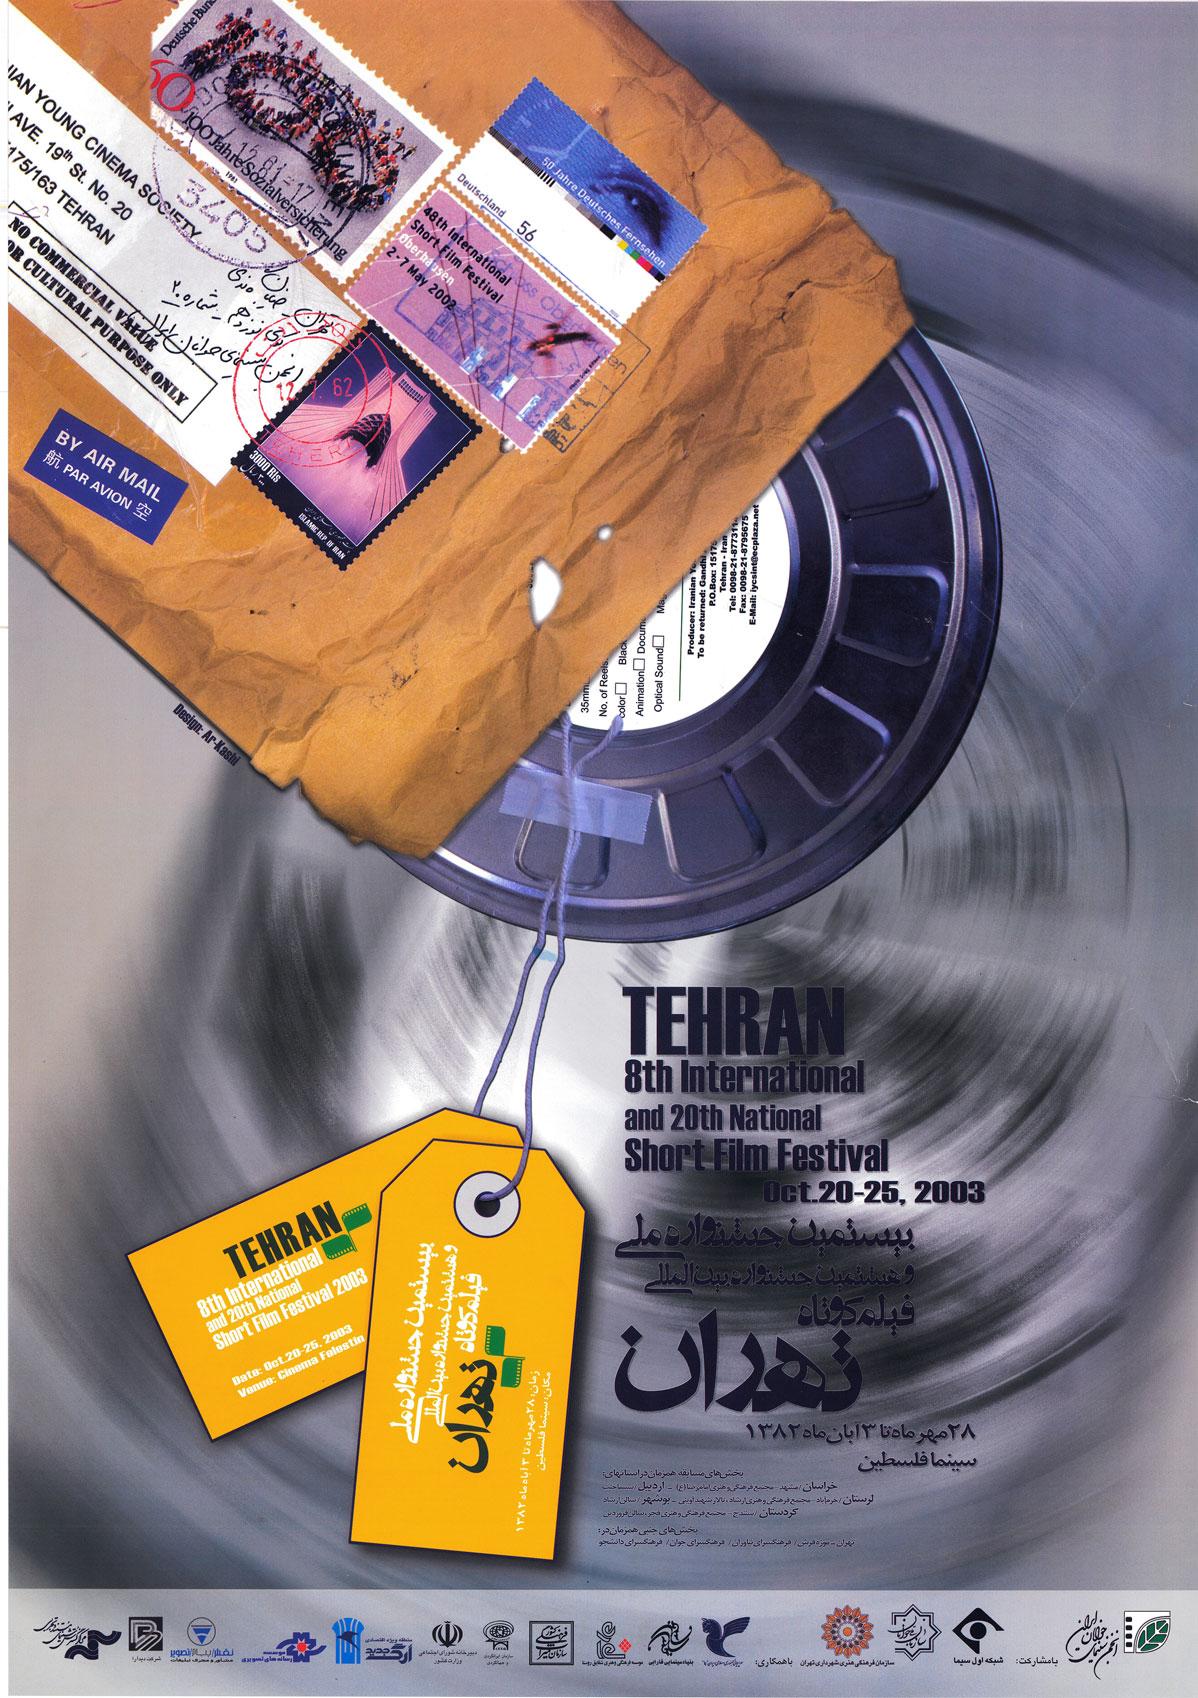 20th Festival 2003